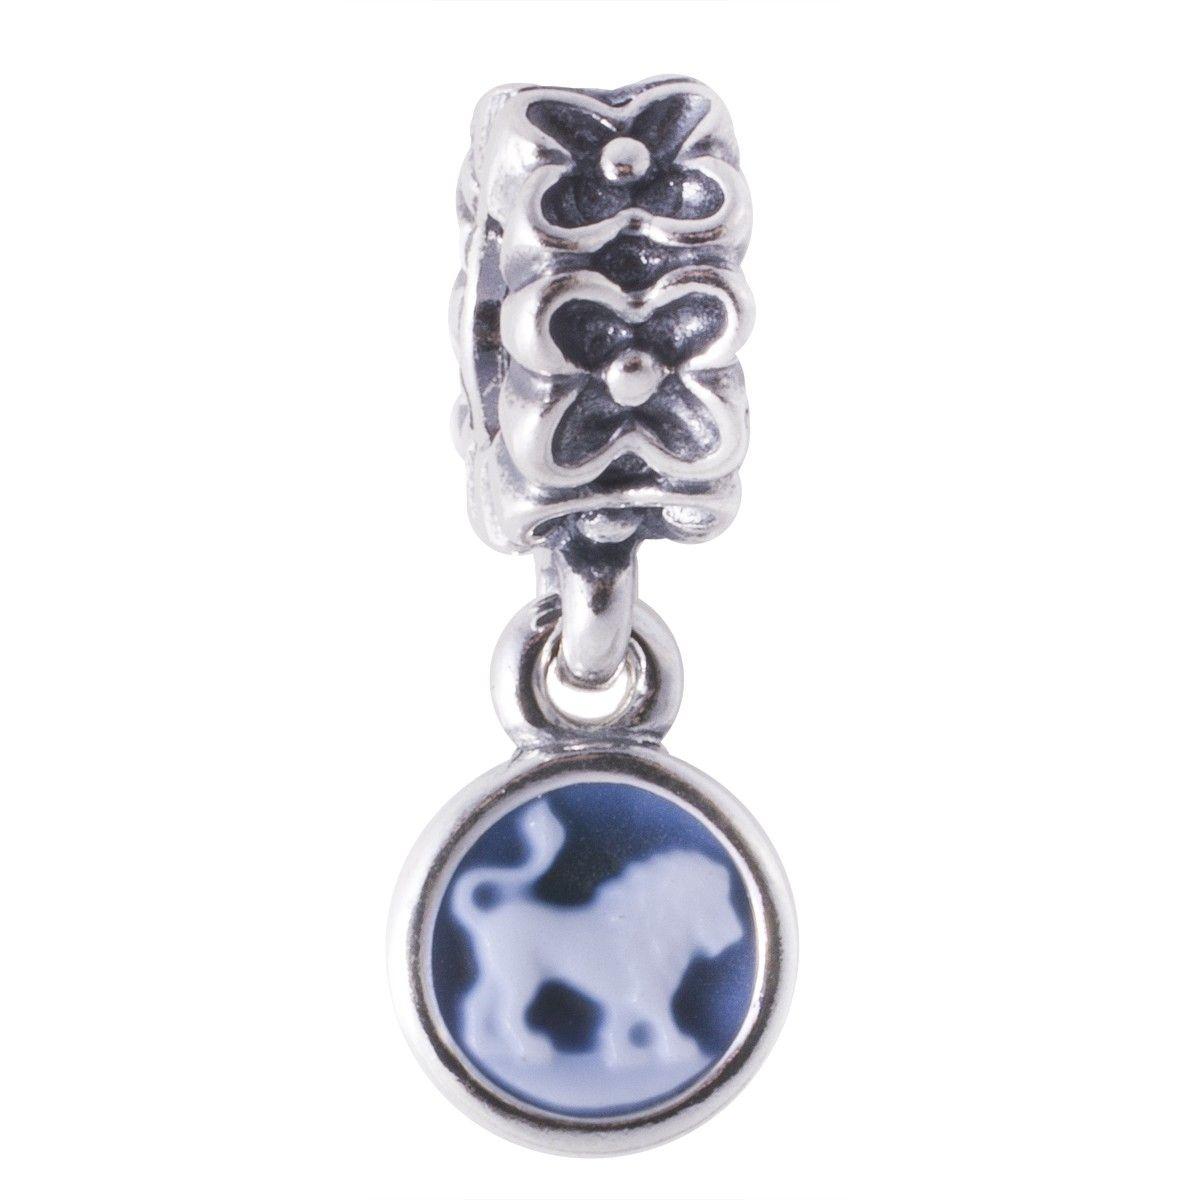 1c2a2462b Pandora Sterling Silver Zodiac Leo Cameo Dangle Charm Item Number:  790500CAM08